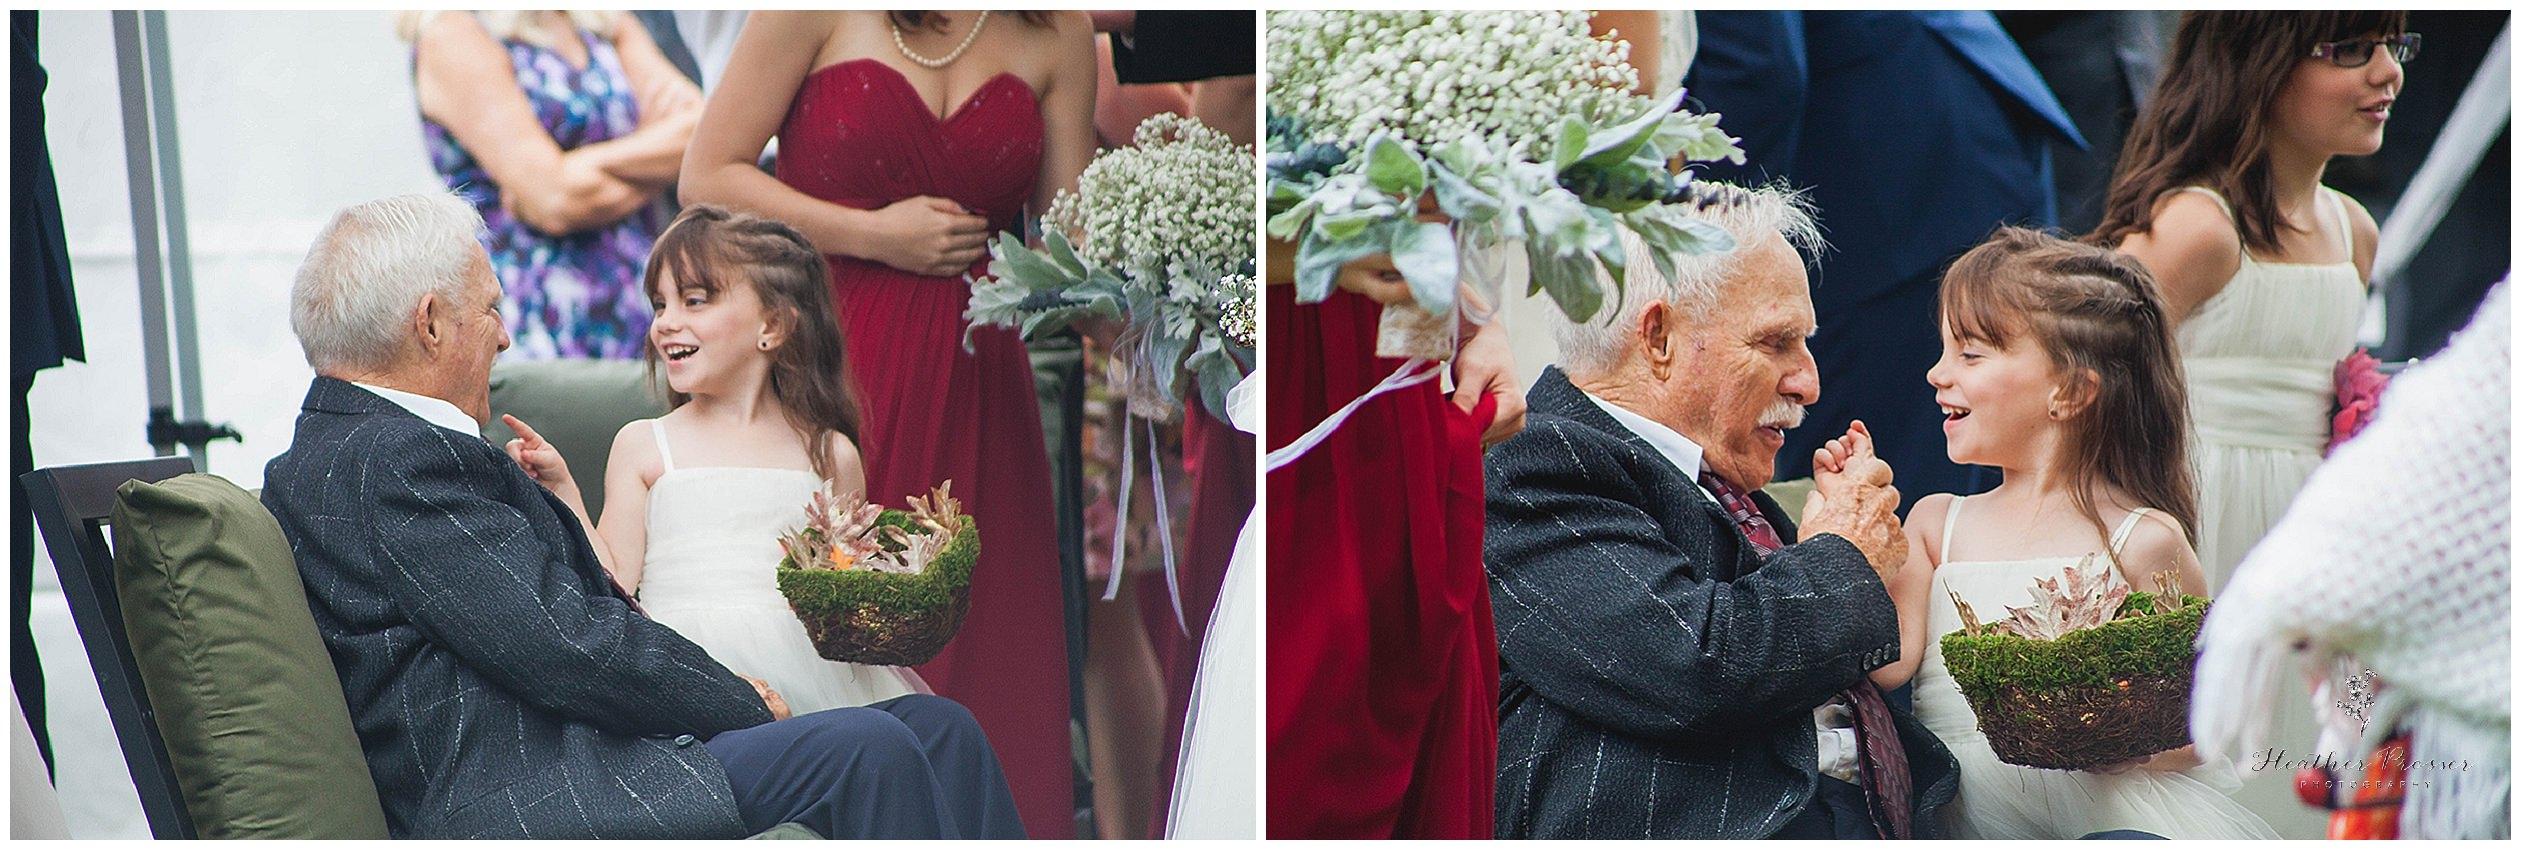 Bowmanville Wedding Photography_0209.jpg